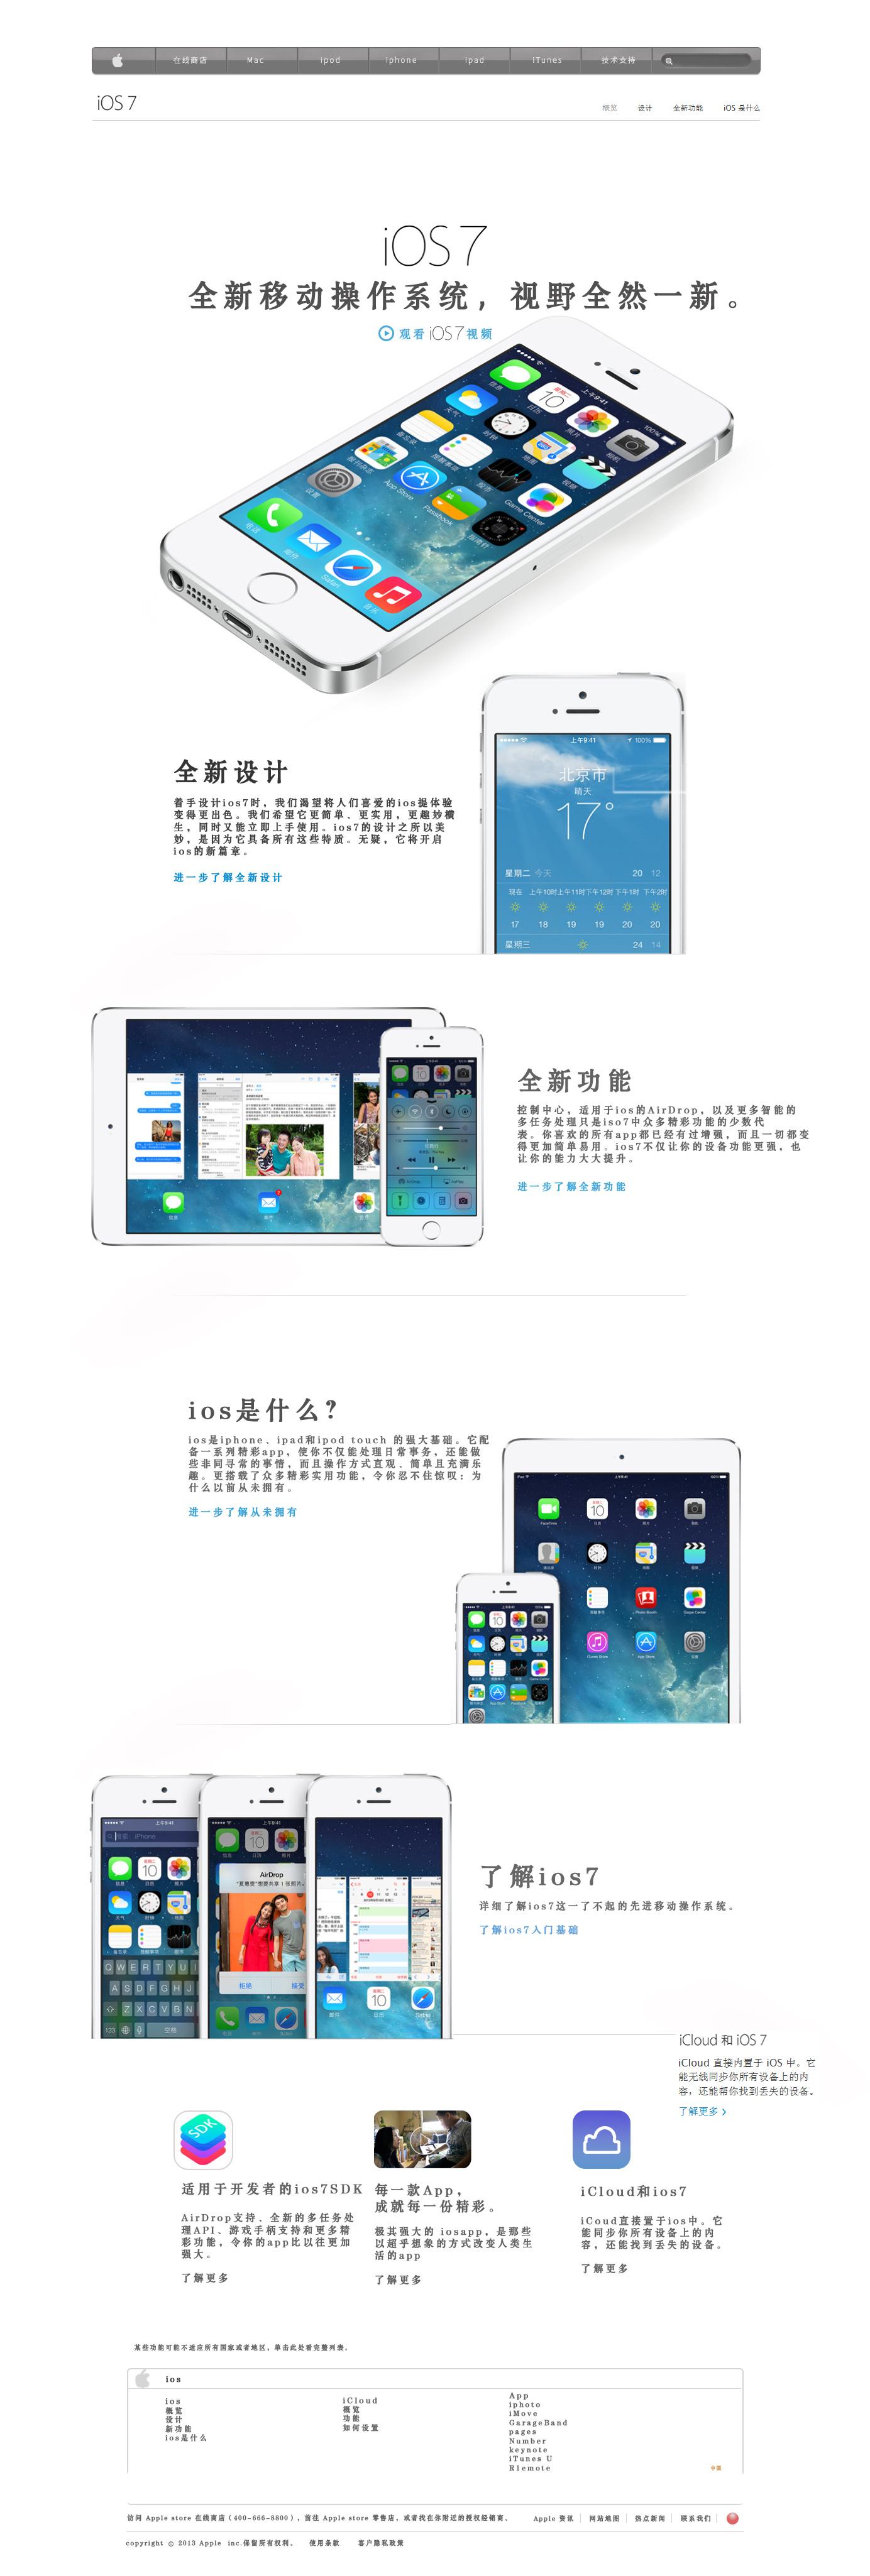 跹n/ycj�(h_手机app界面 ui app界面 ycjui - 原创作品 - 站酷